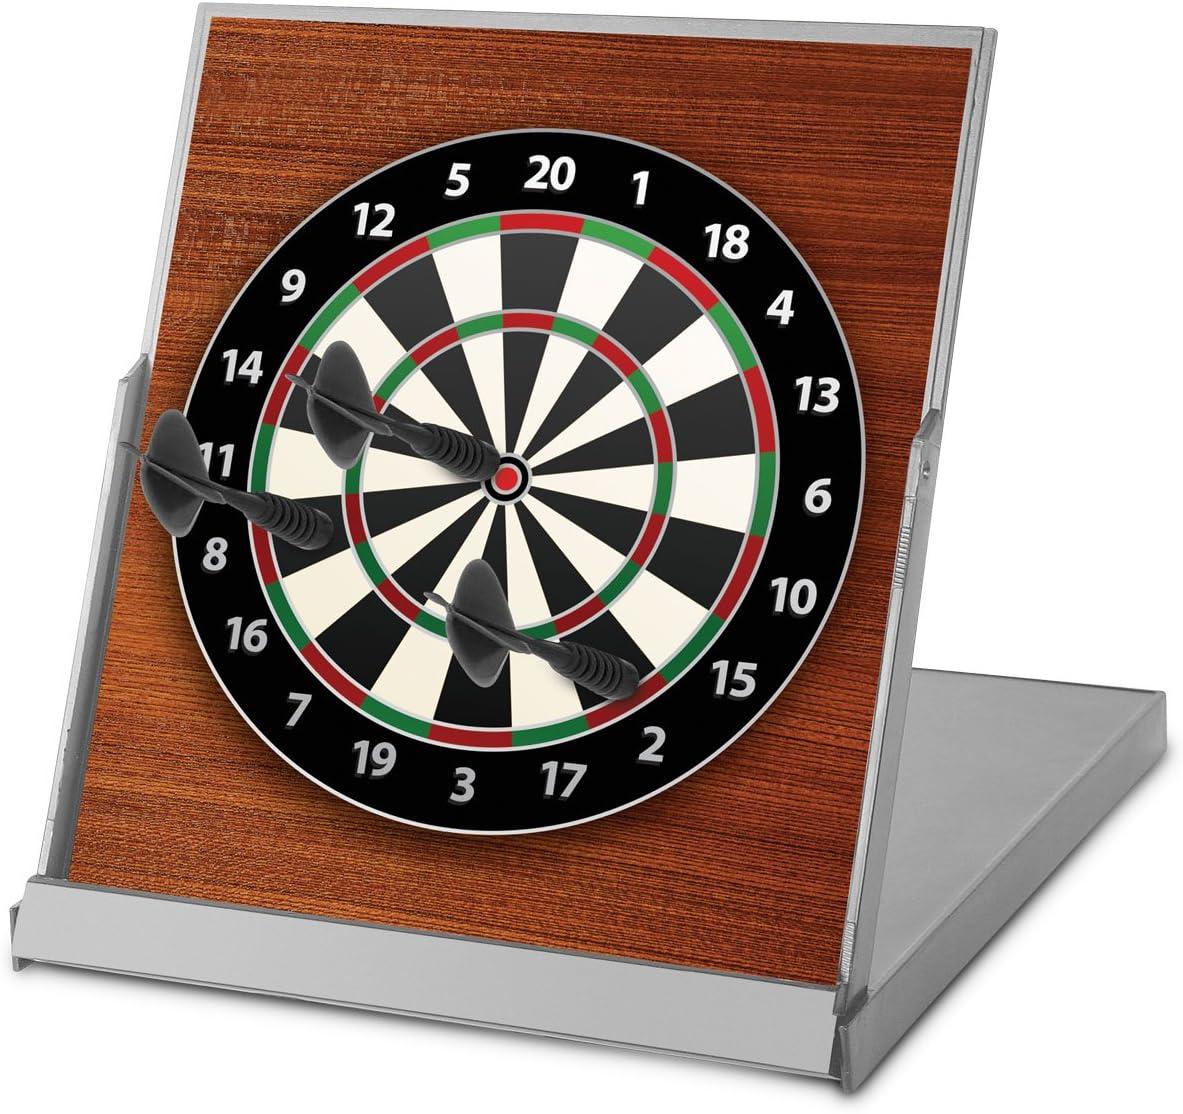 Meridian Point Desktop Miniature Dartboard Game